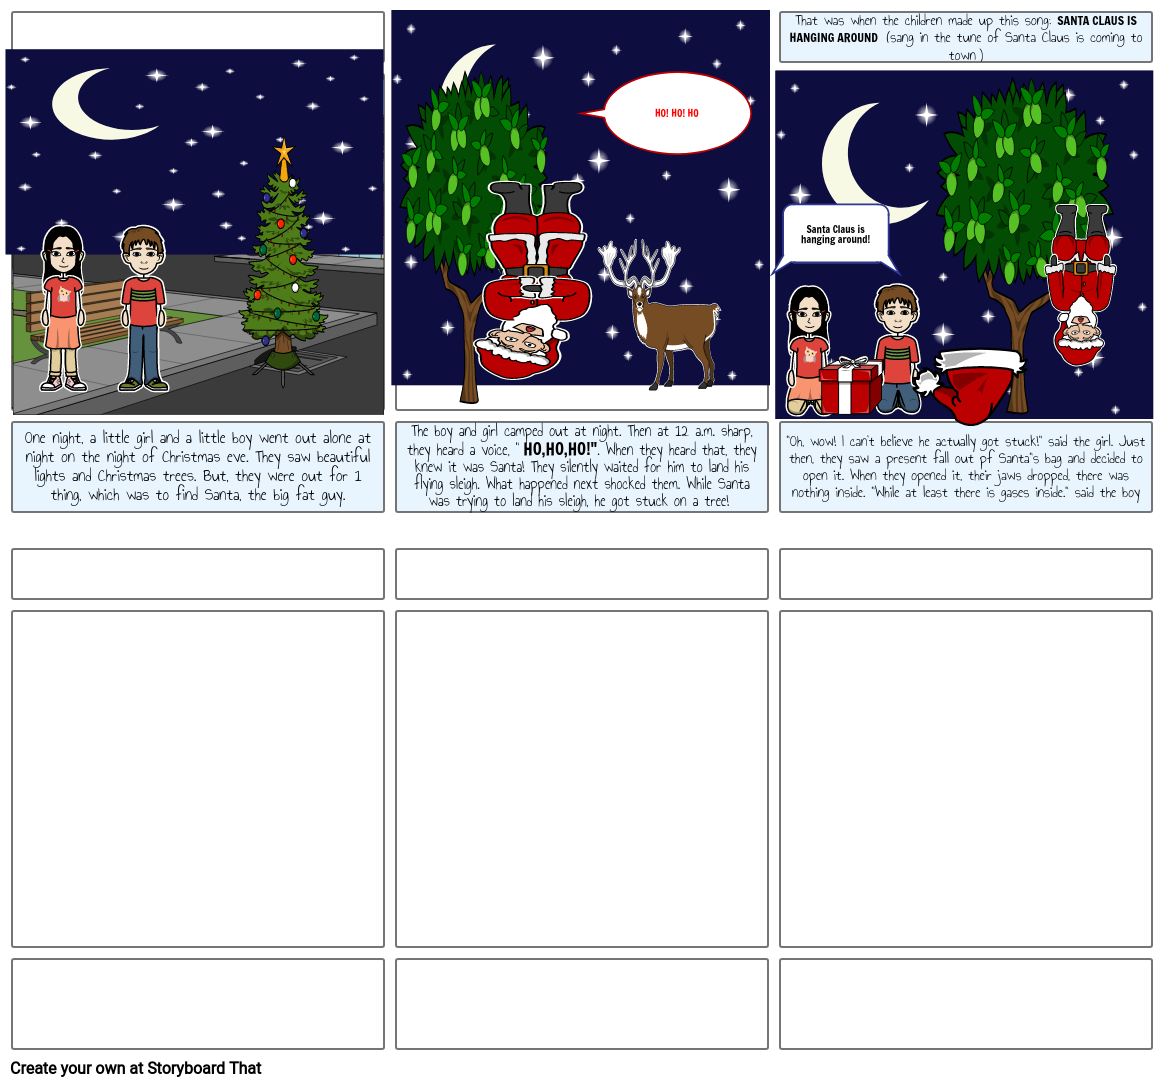 The Real story of Santa Claus